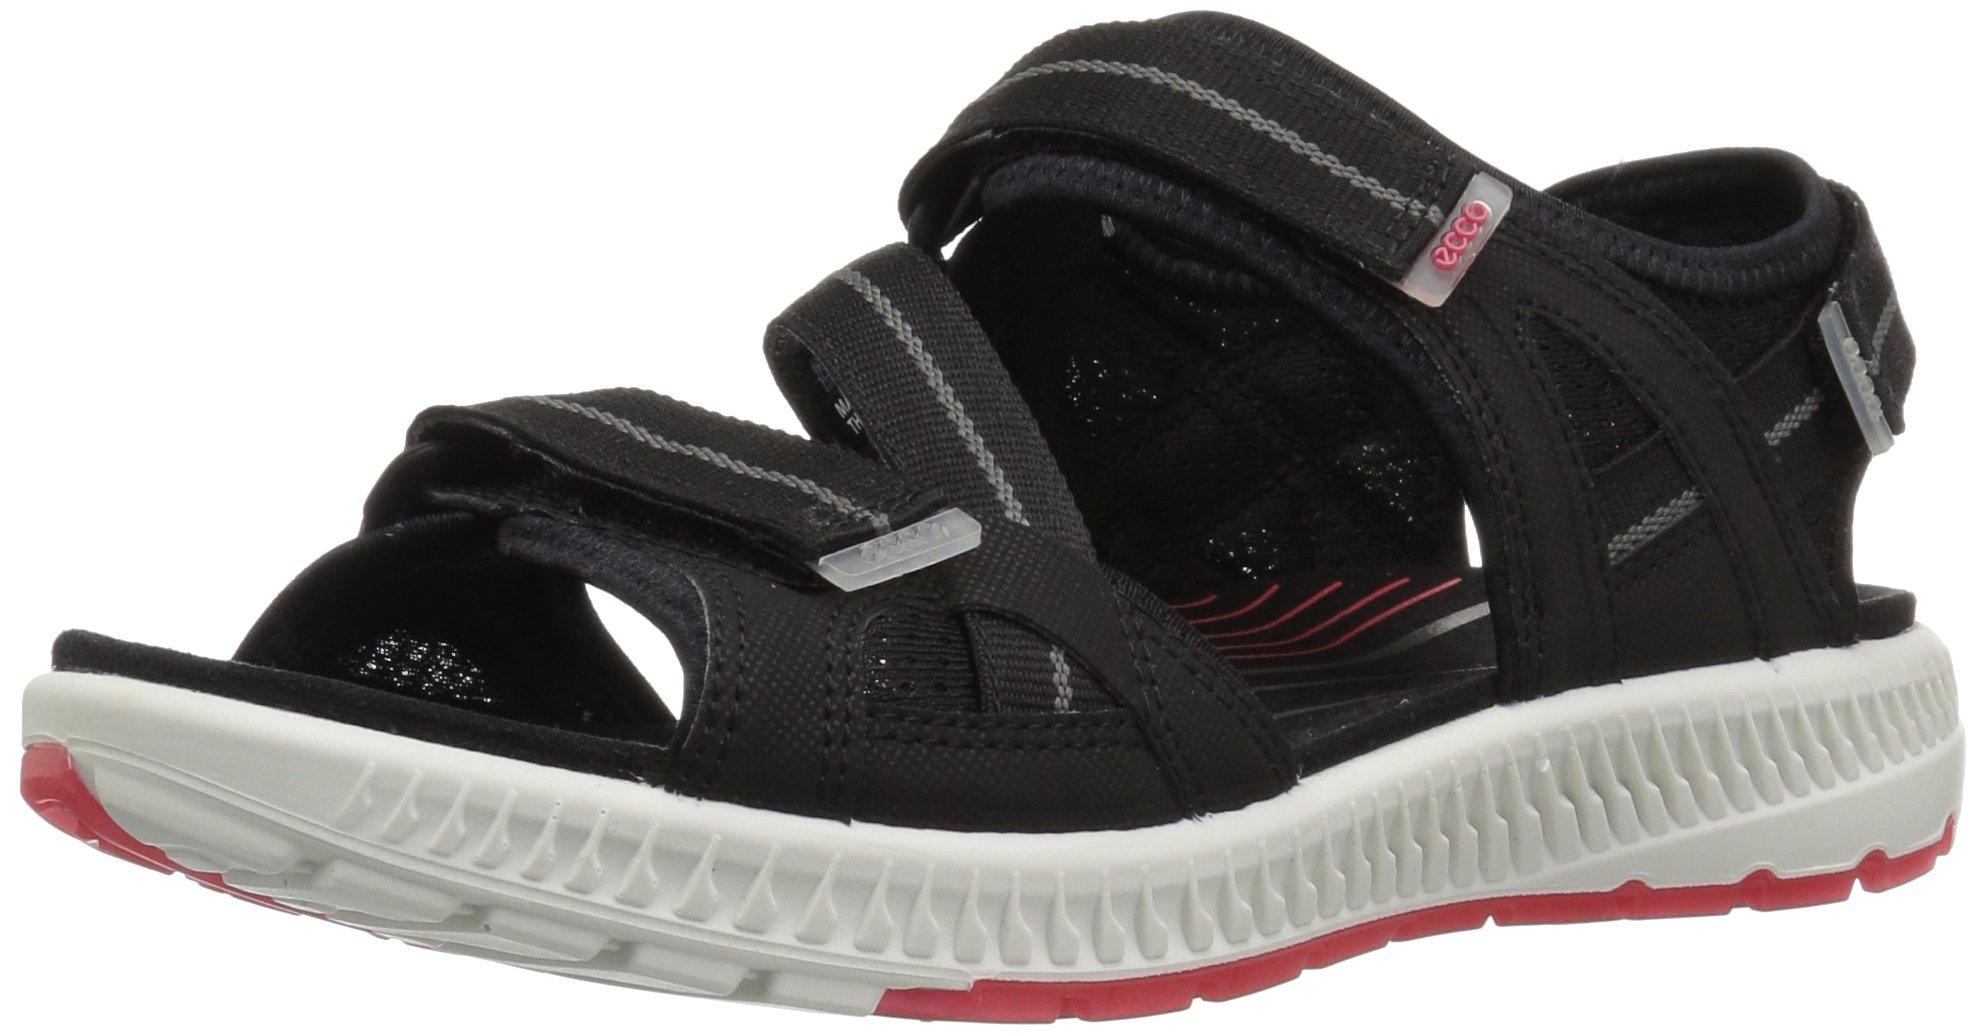 ECCO Women's Terra 3S Athletic Sandal, Black/Teaberry, 41 EU/10-10.5 M US